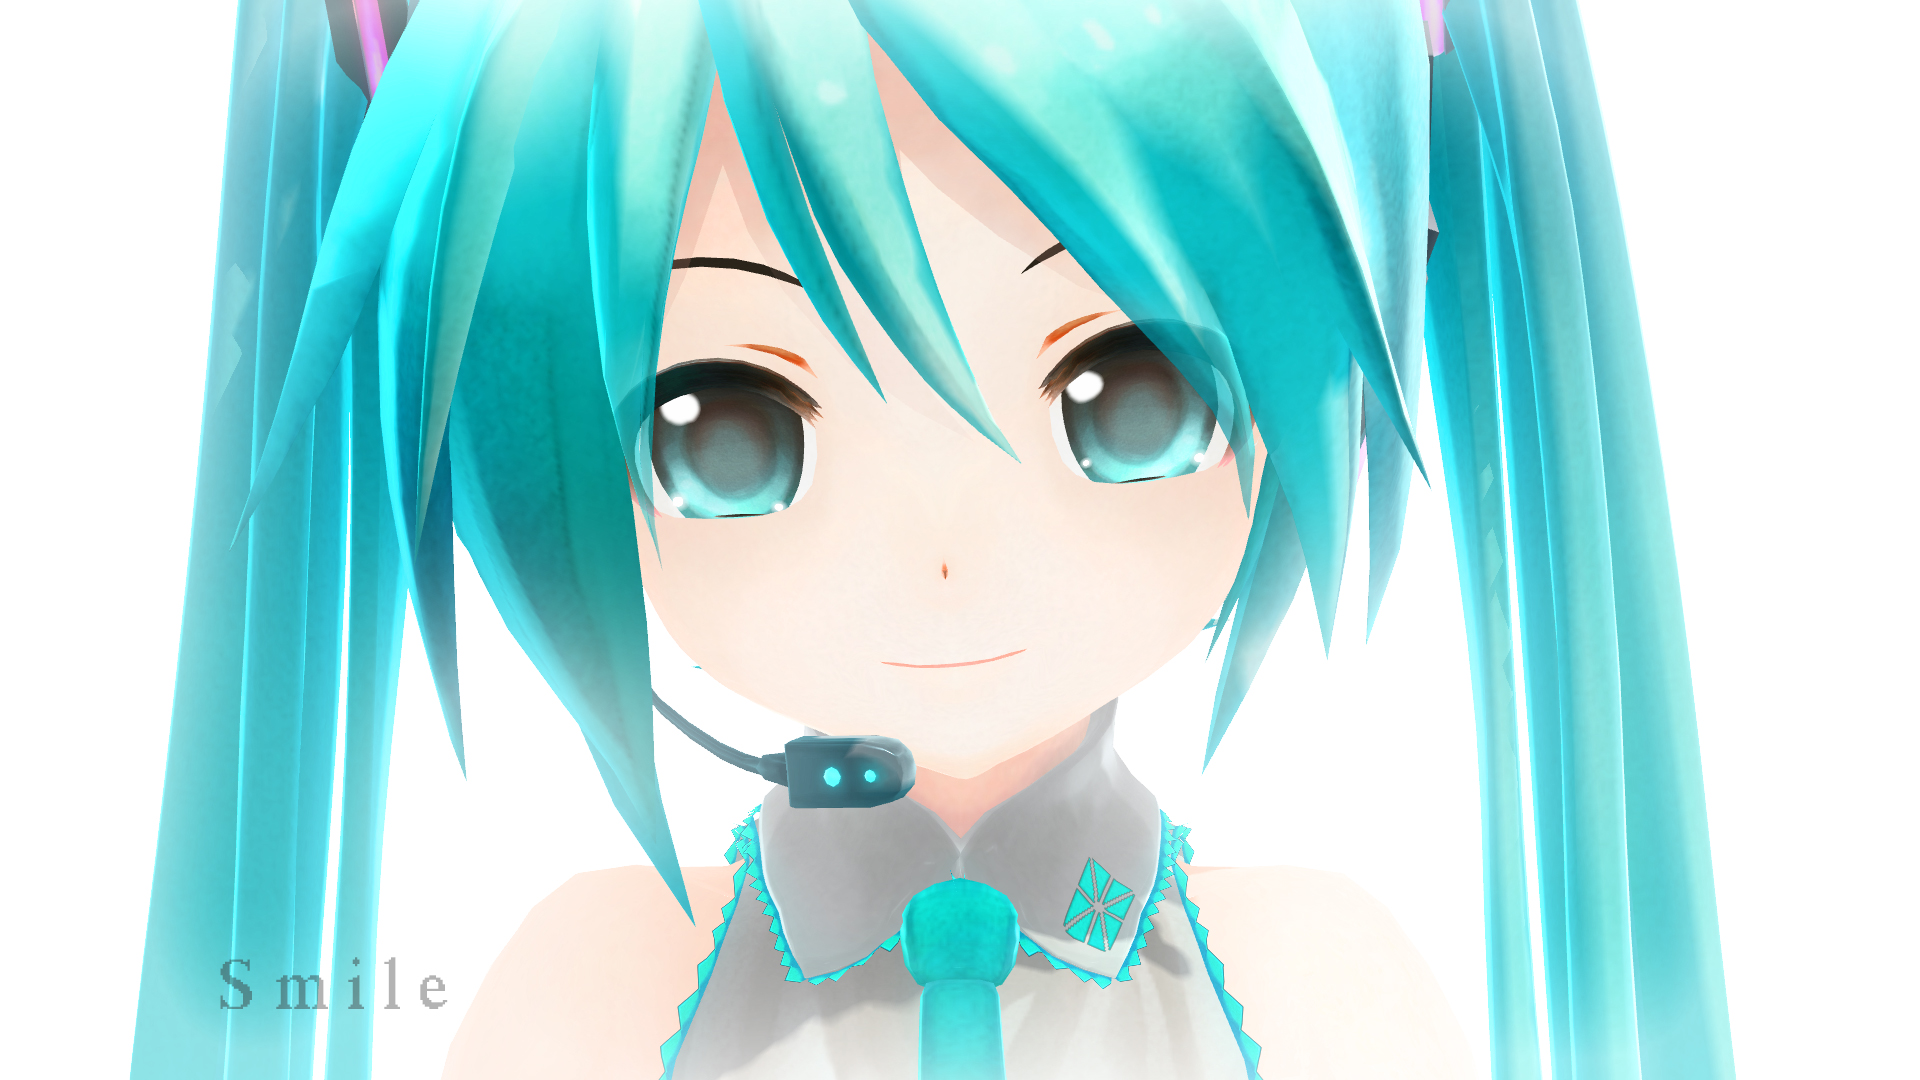 Smile by CV-4C